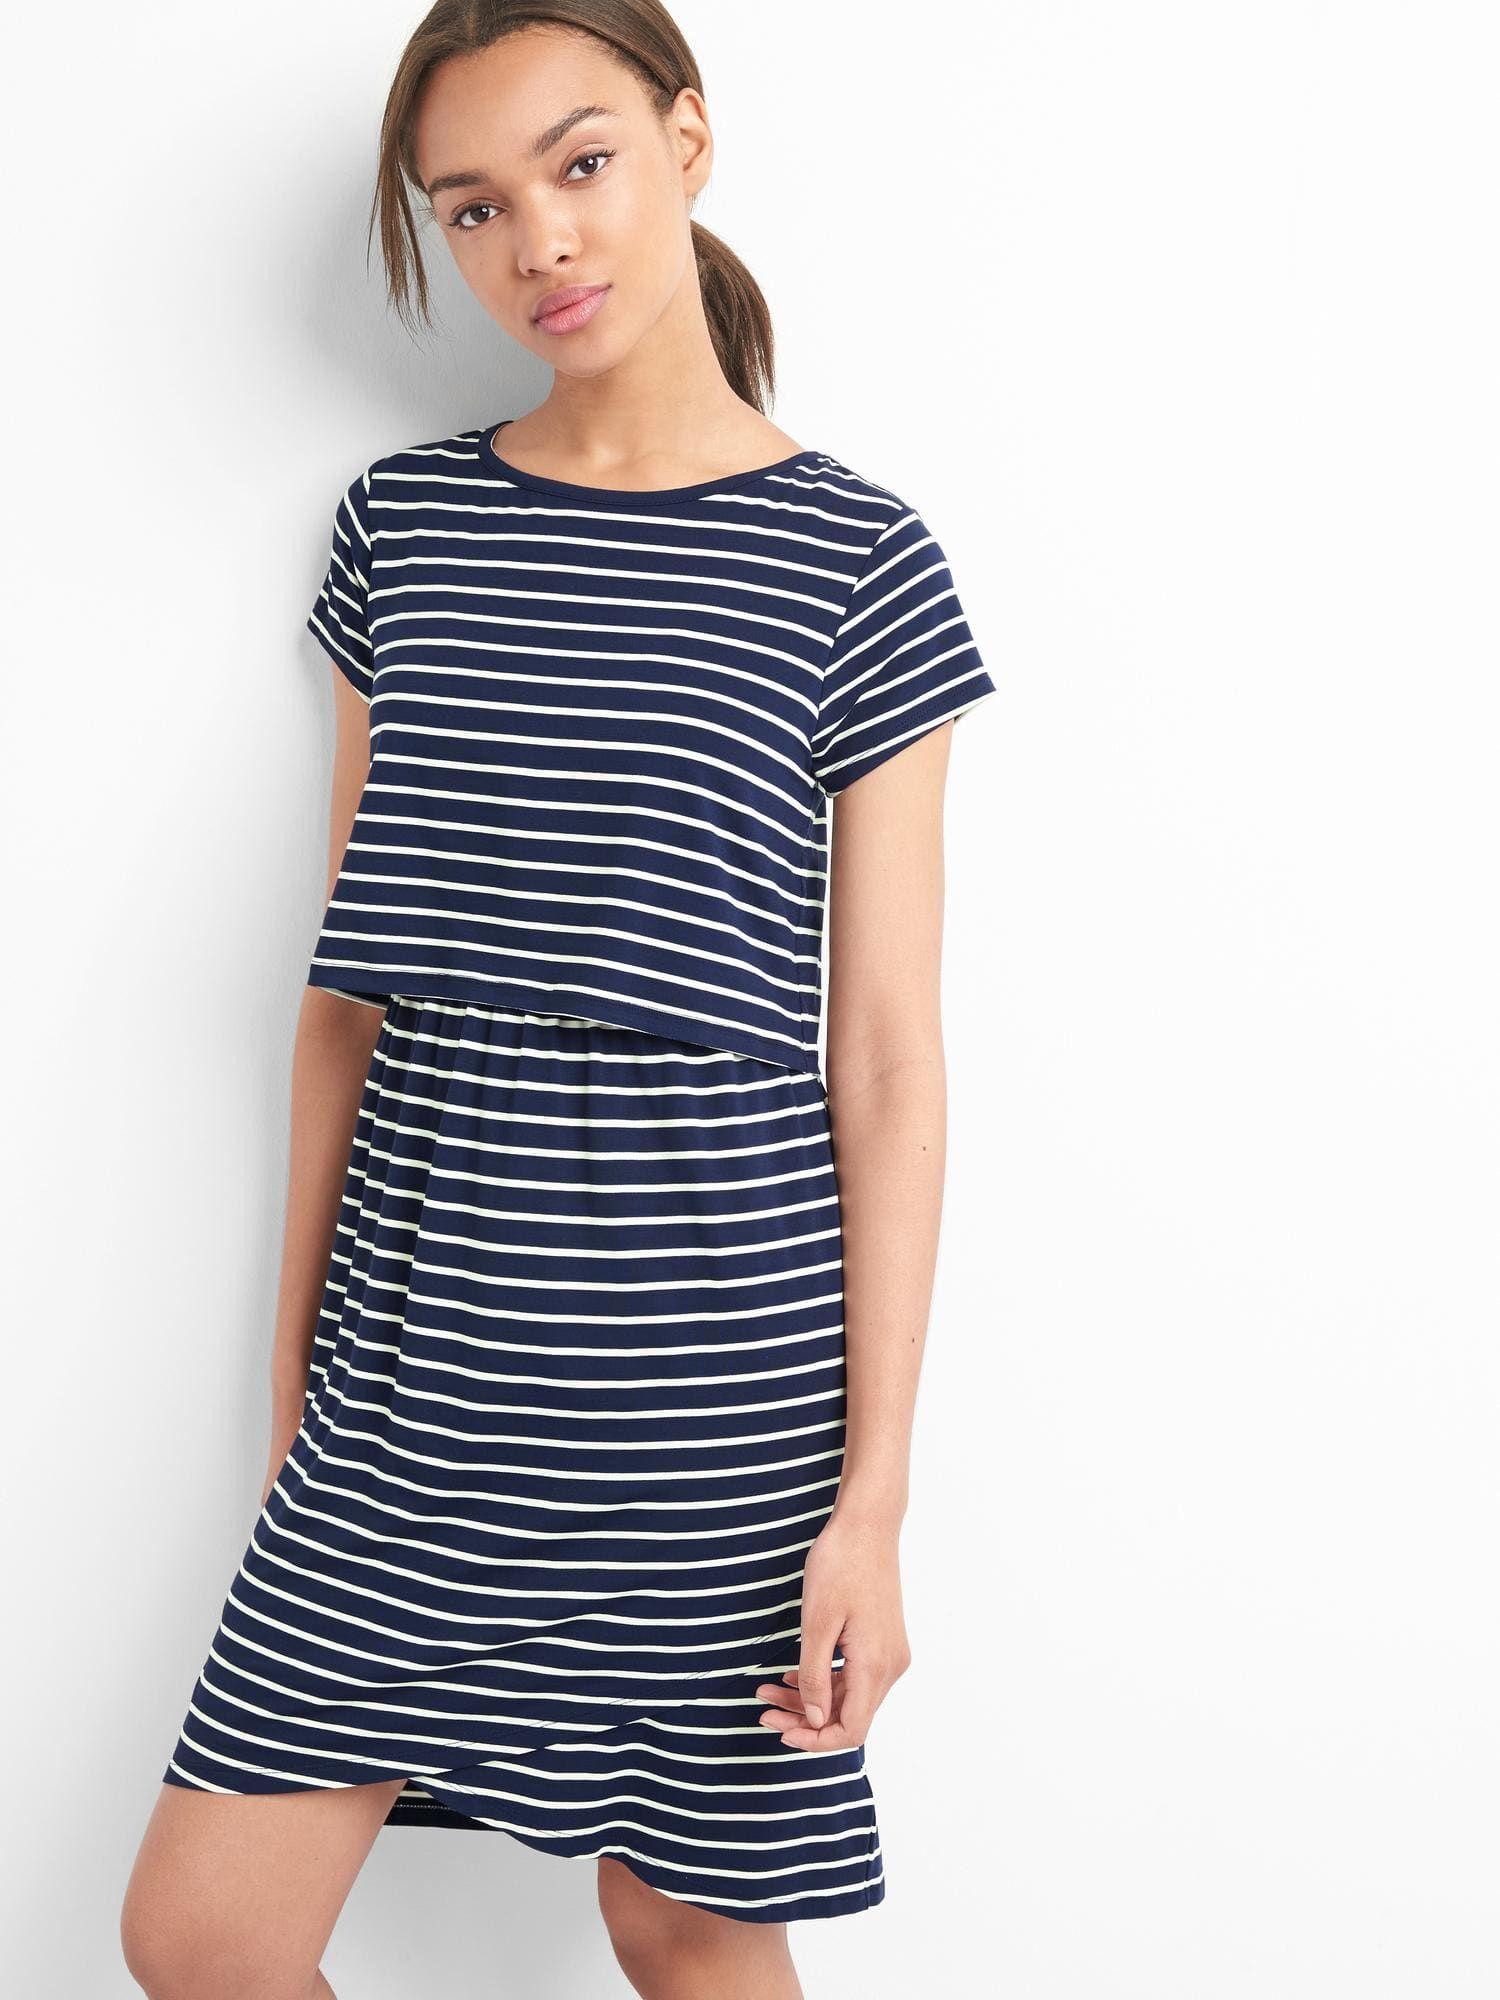 51ebc7eeb12 Maternity Stripe Layered Nursing T-Shirt Dress | wish list | Shirt ...